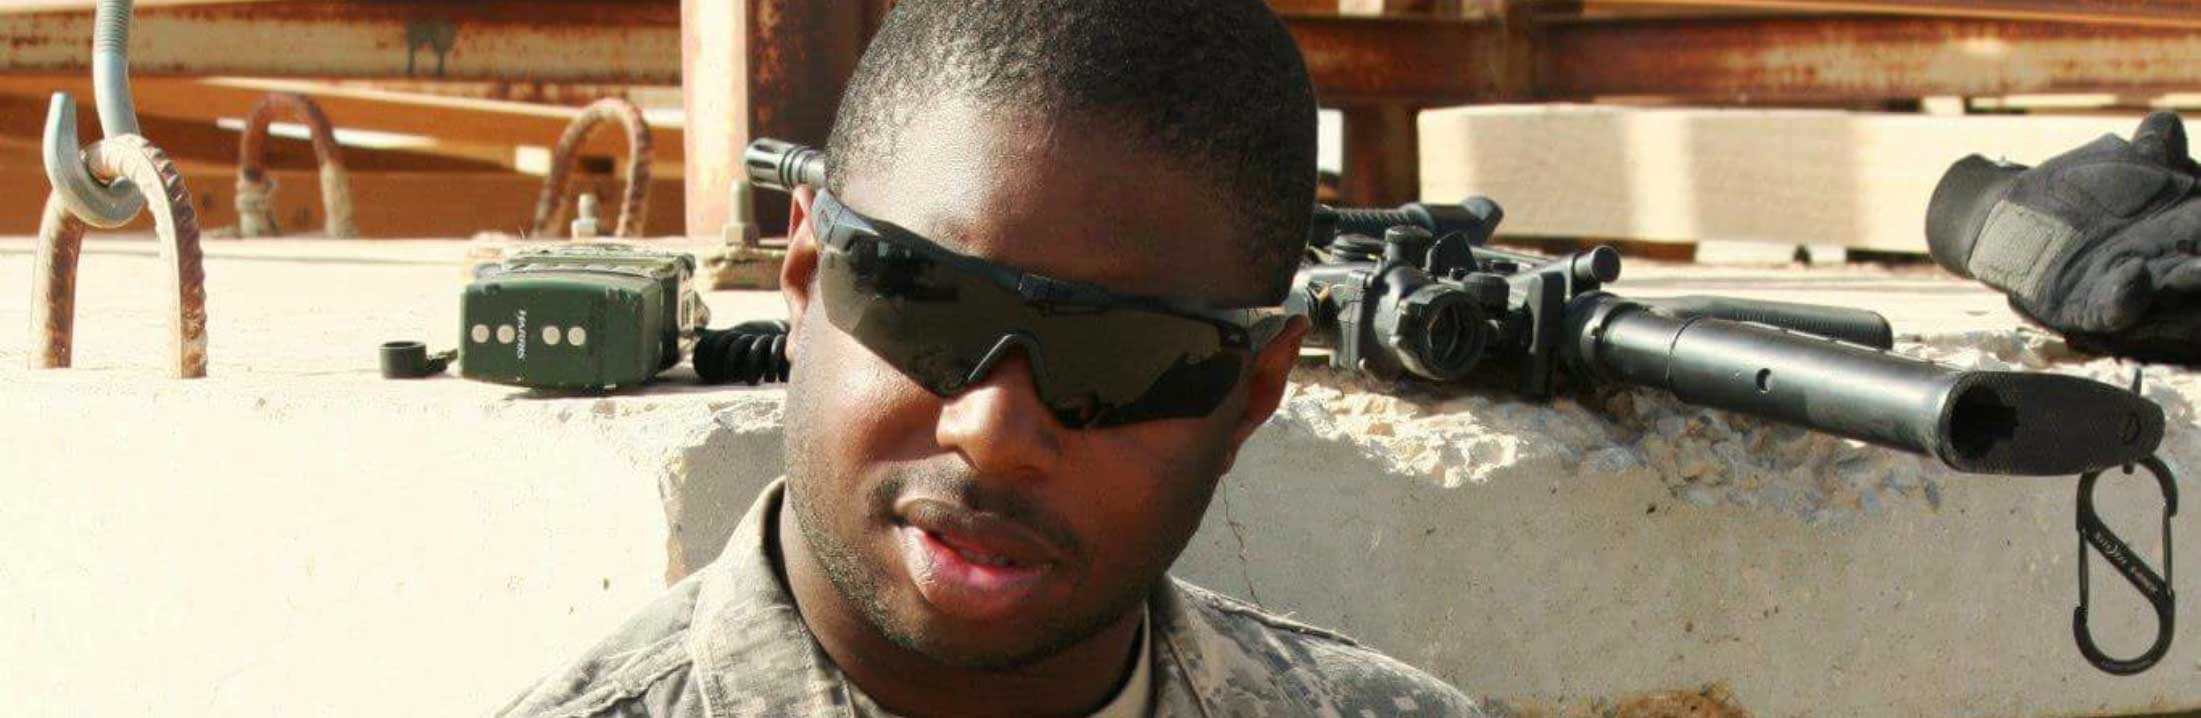 Citizen-Warrior: Military, civilian experience enhances Soldier's  situational awareness